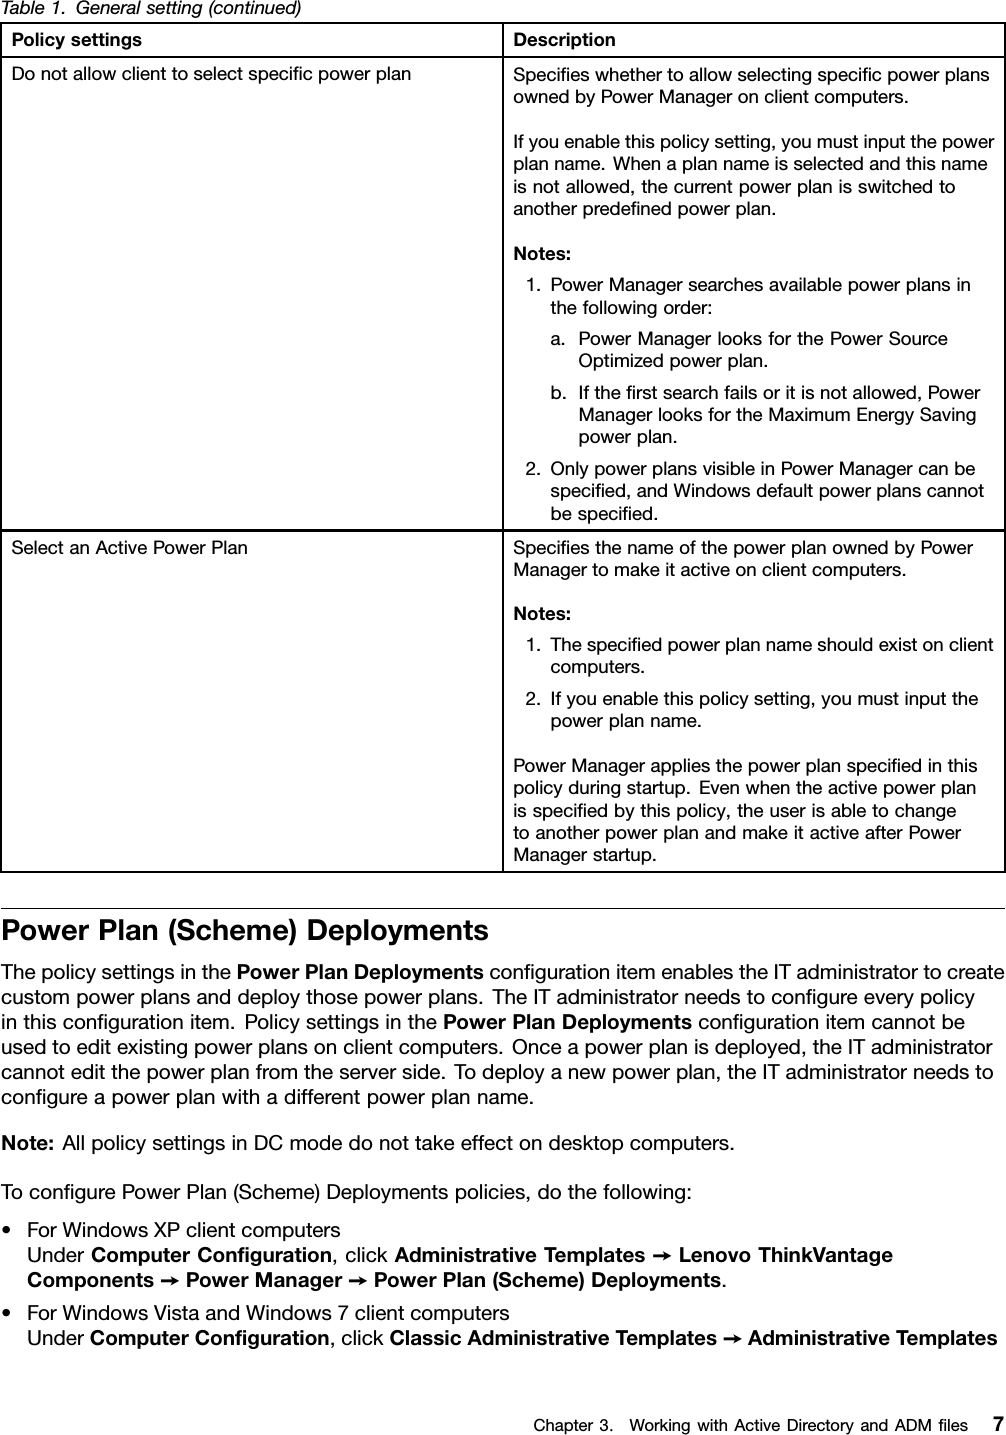 Lenovo Dpmmst En User Manual (English) Power Manager Deployment